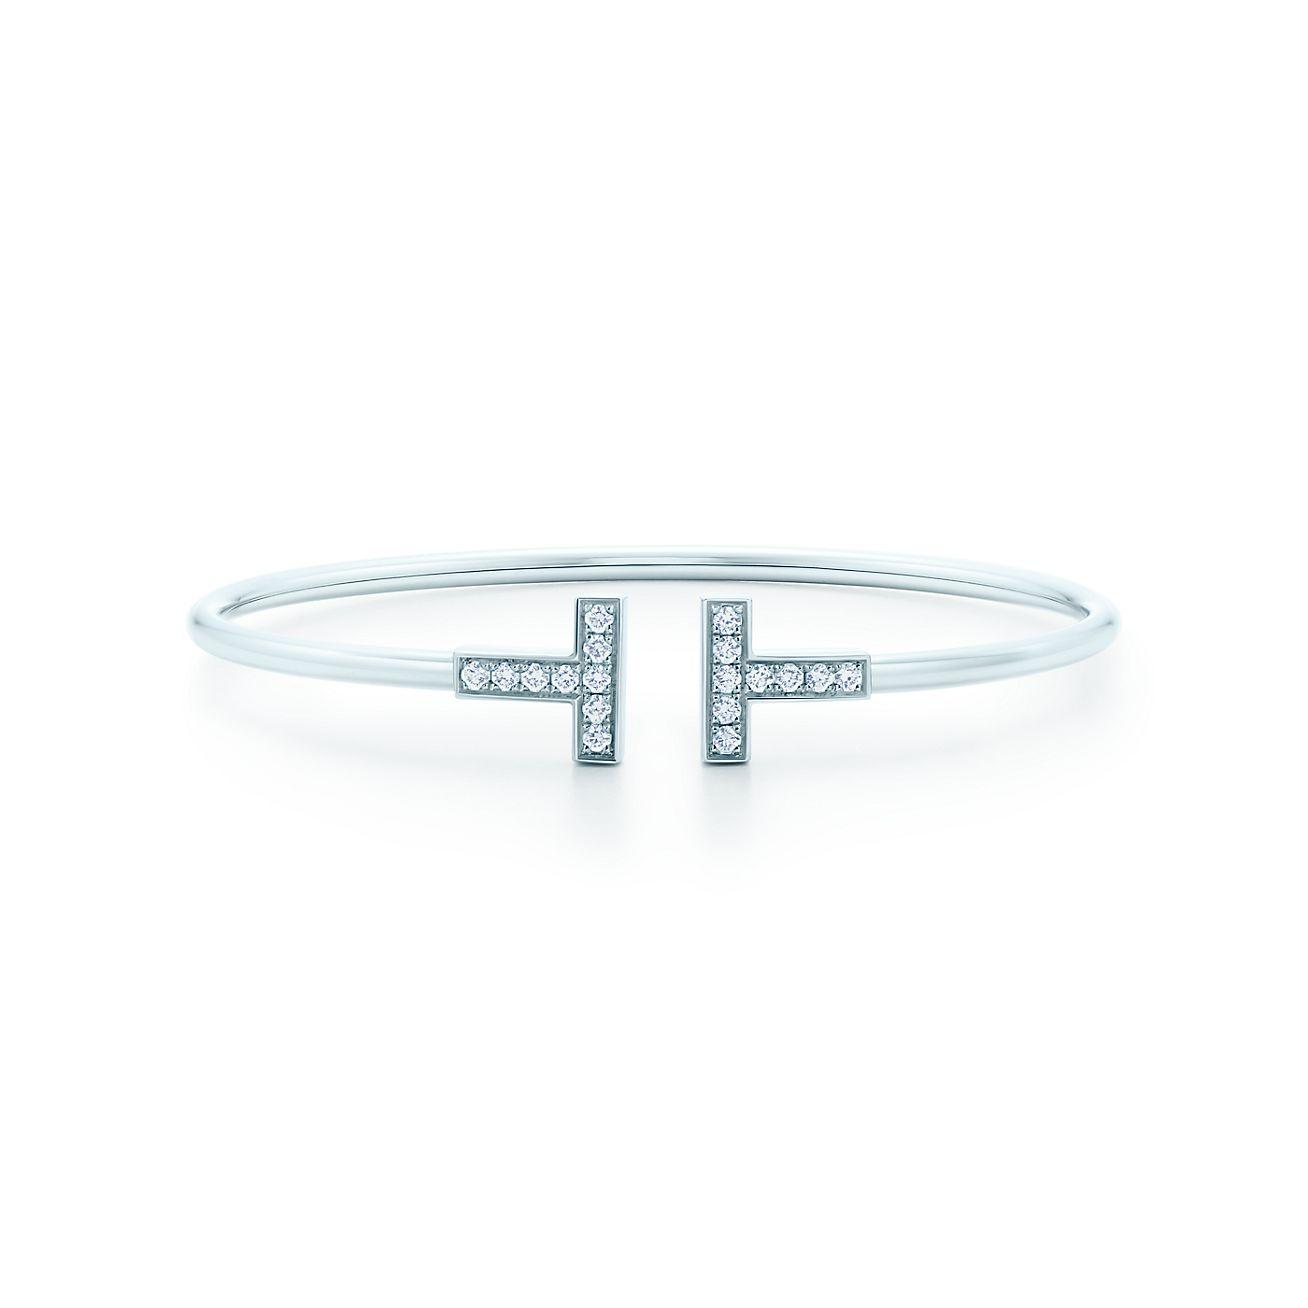 Tiffany T Wire Bracelet In 18k White Gold With Diamonds Medium